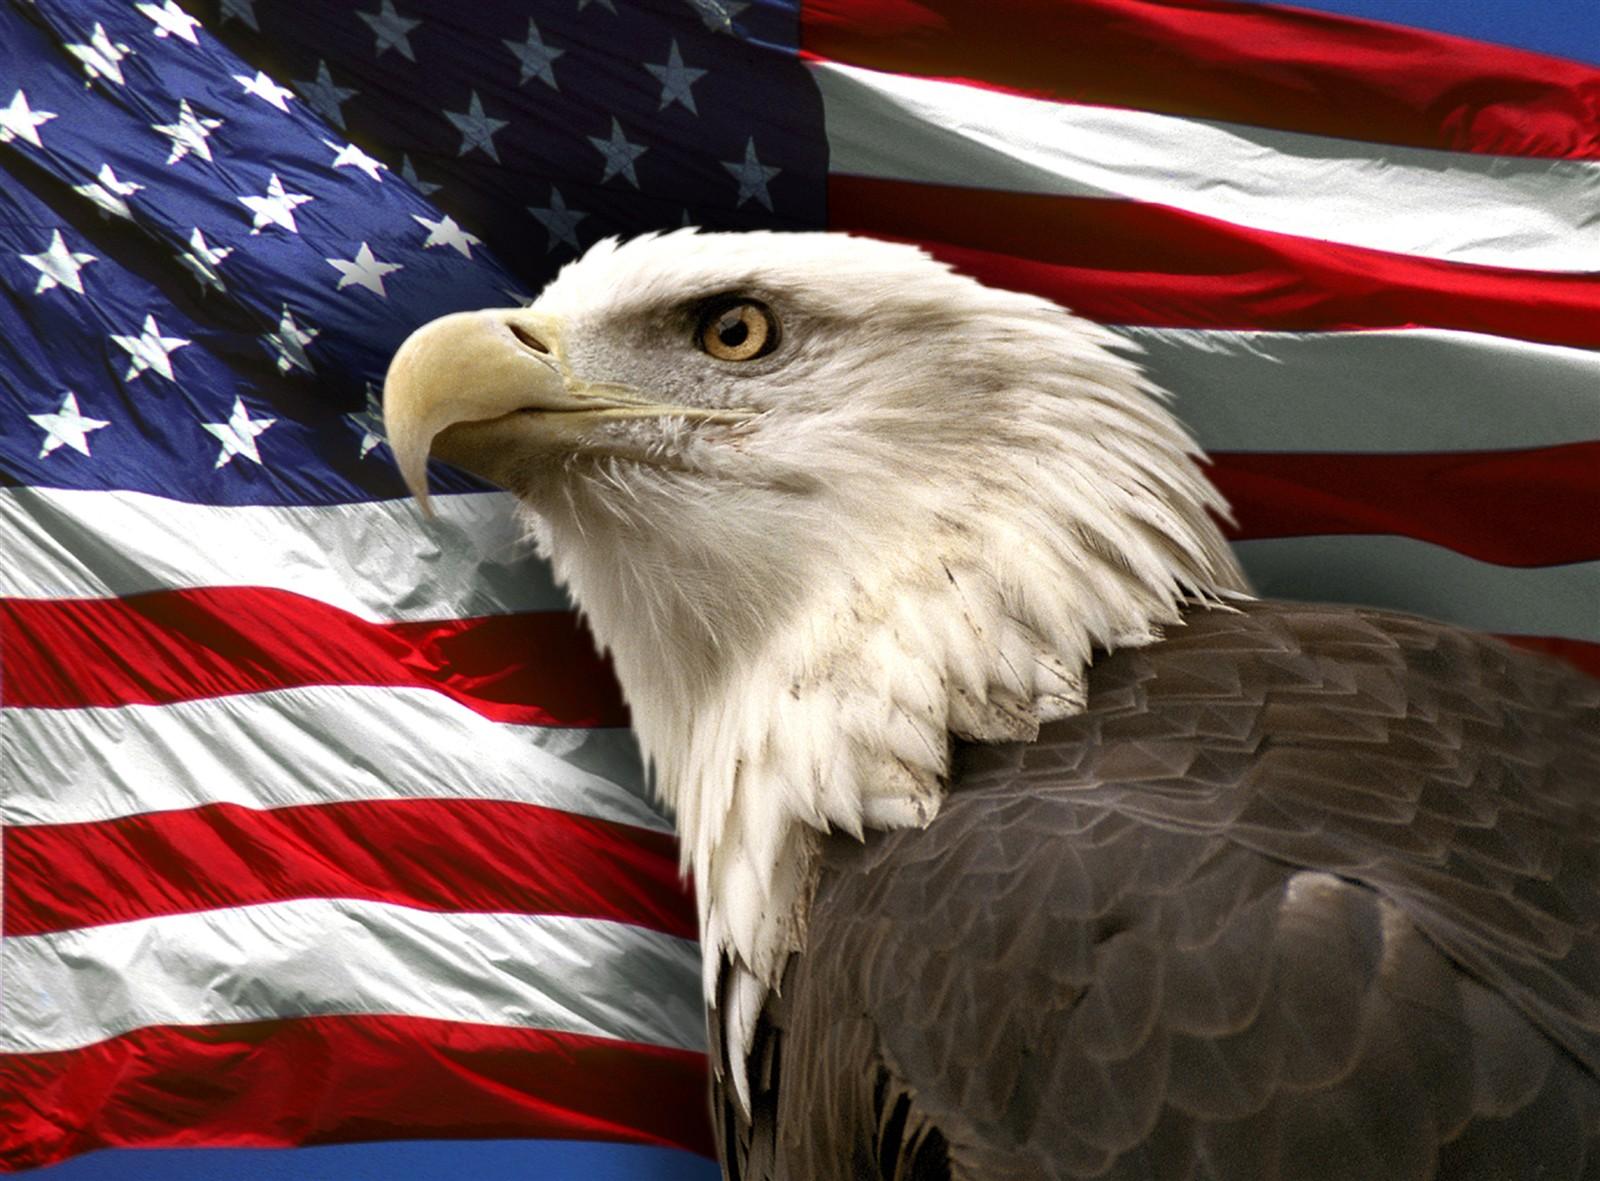 american flag bald eagle images dowload american flag bald eagle 1600x1181